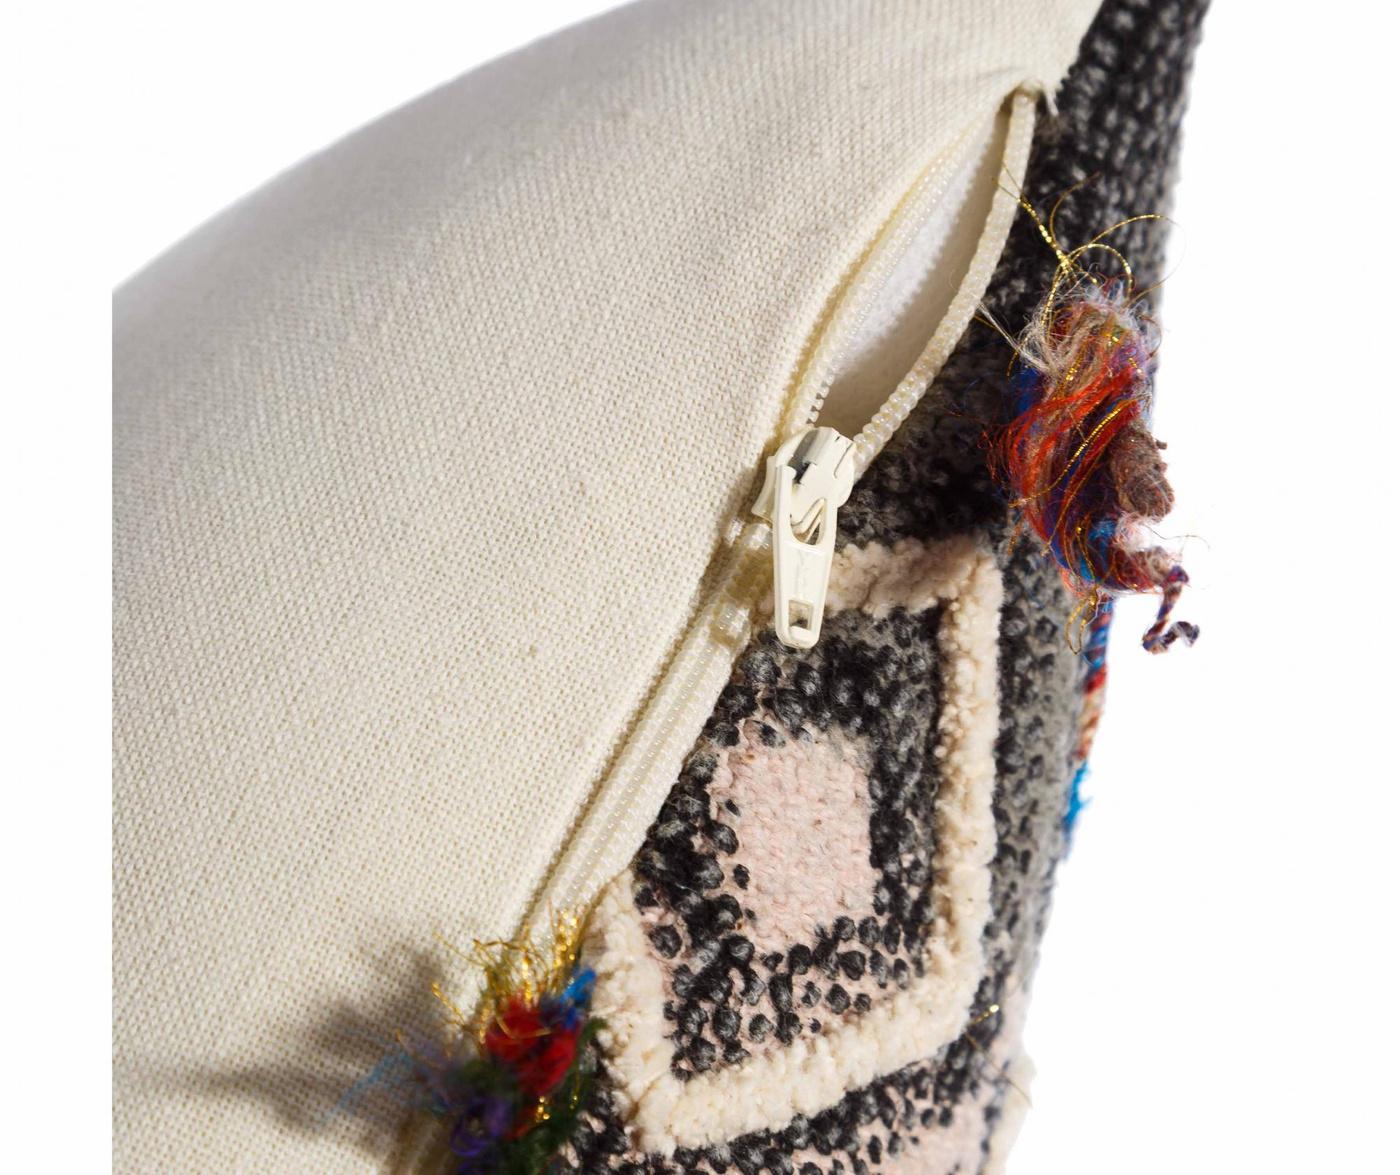 Ukrasni jastuk Maxed Embroidery 45x45 cm